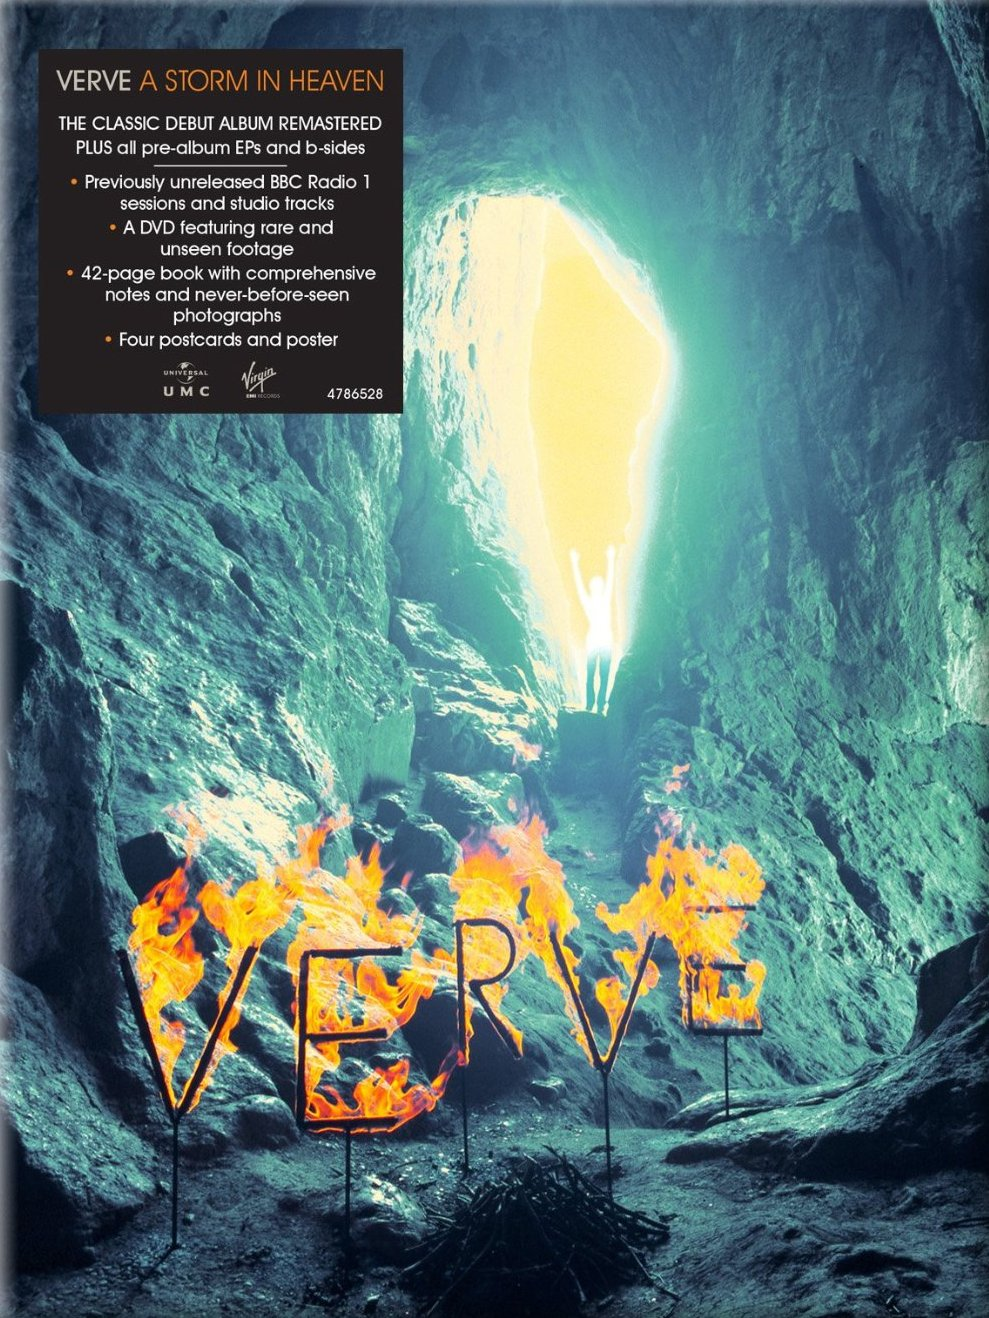 The Verve Live